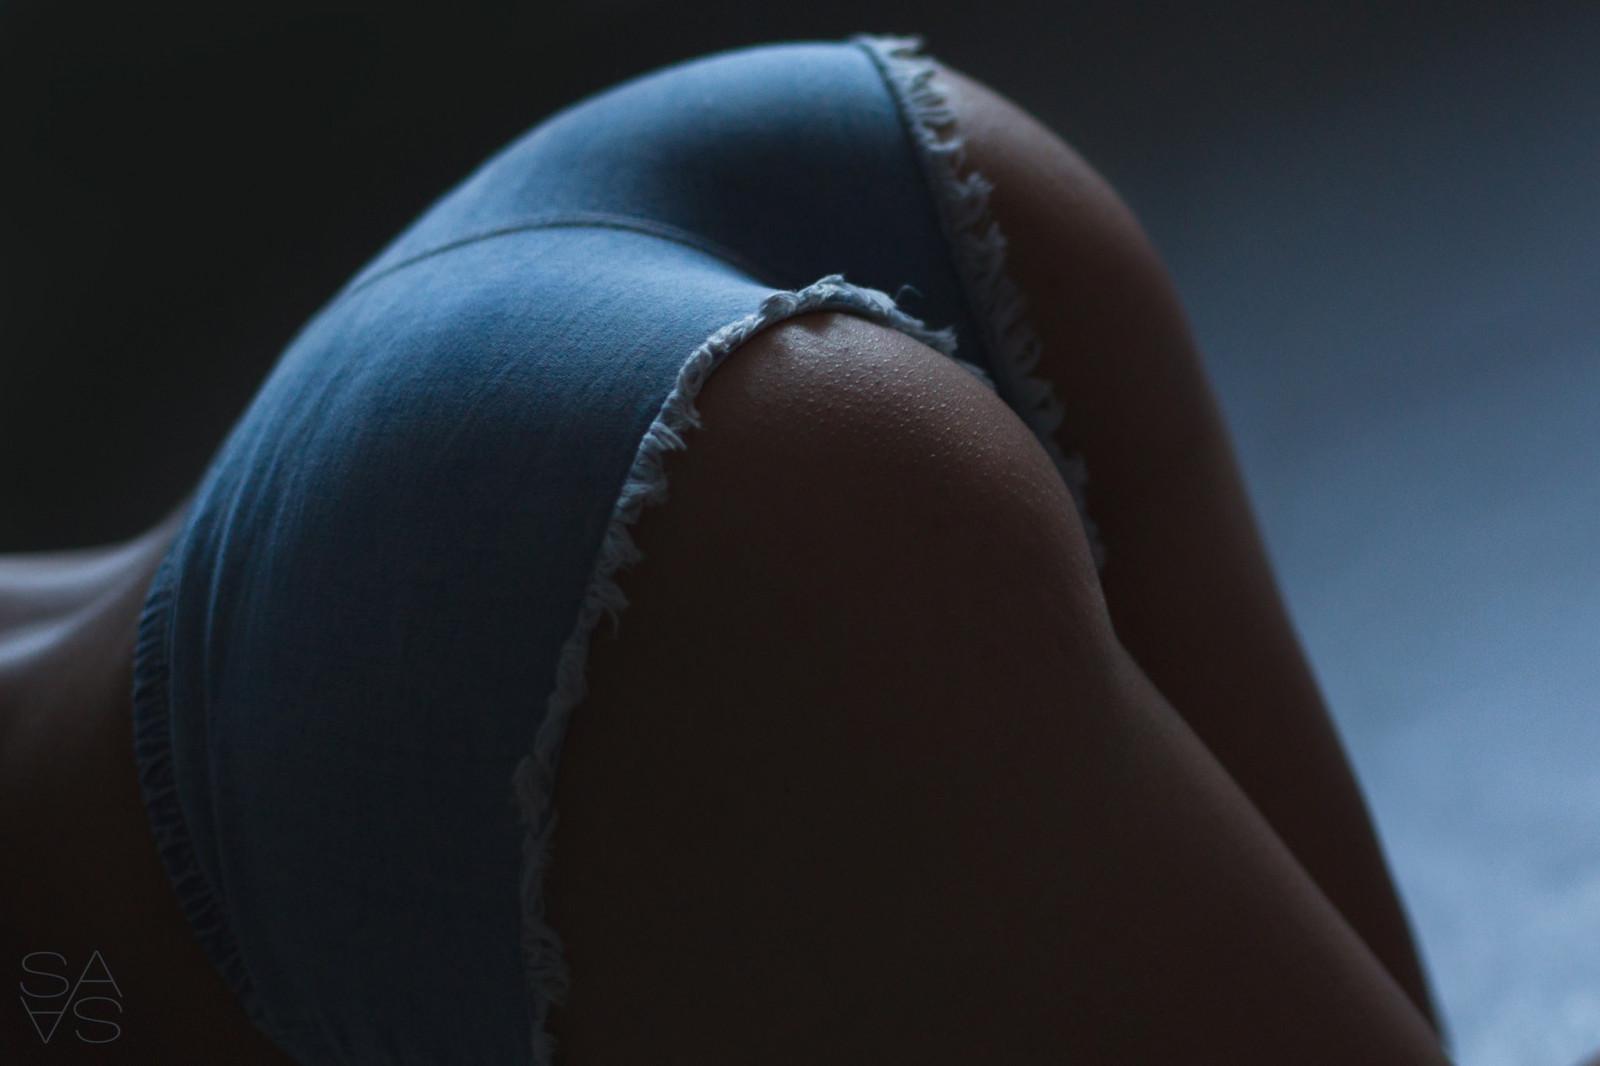 Уломали на секс глупую деваху порно фото бесплатно